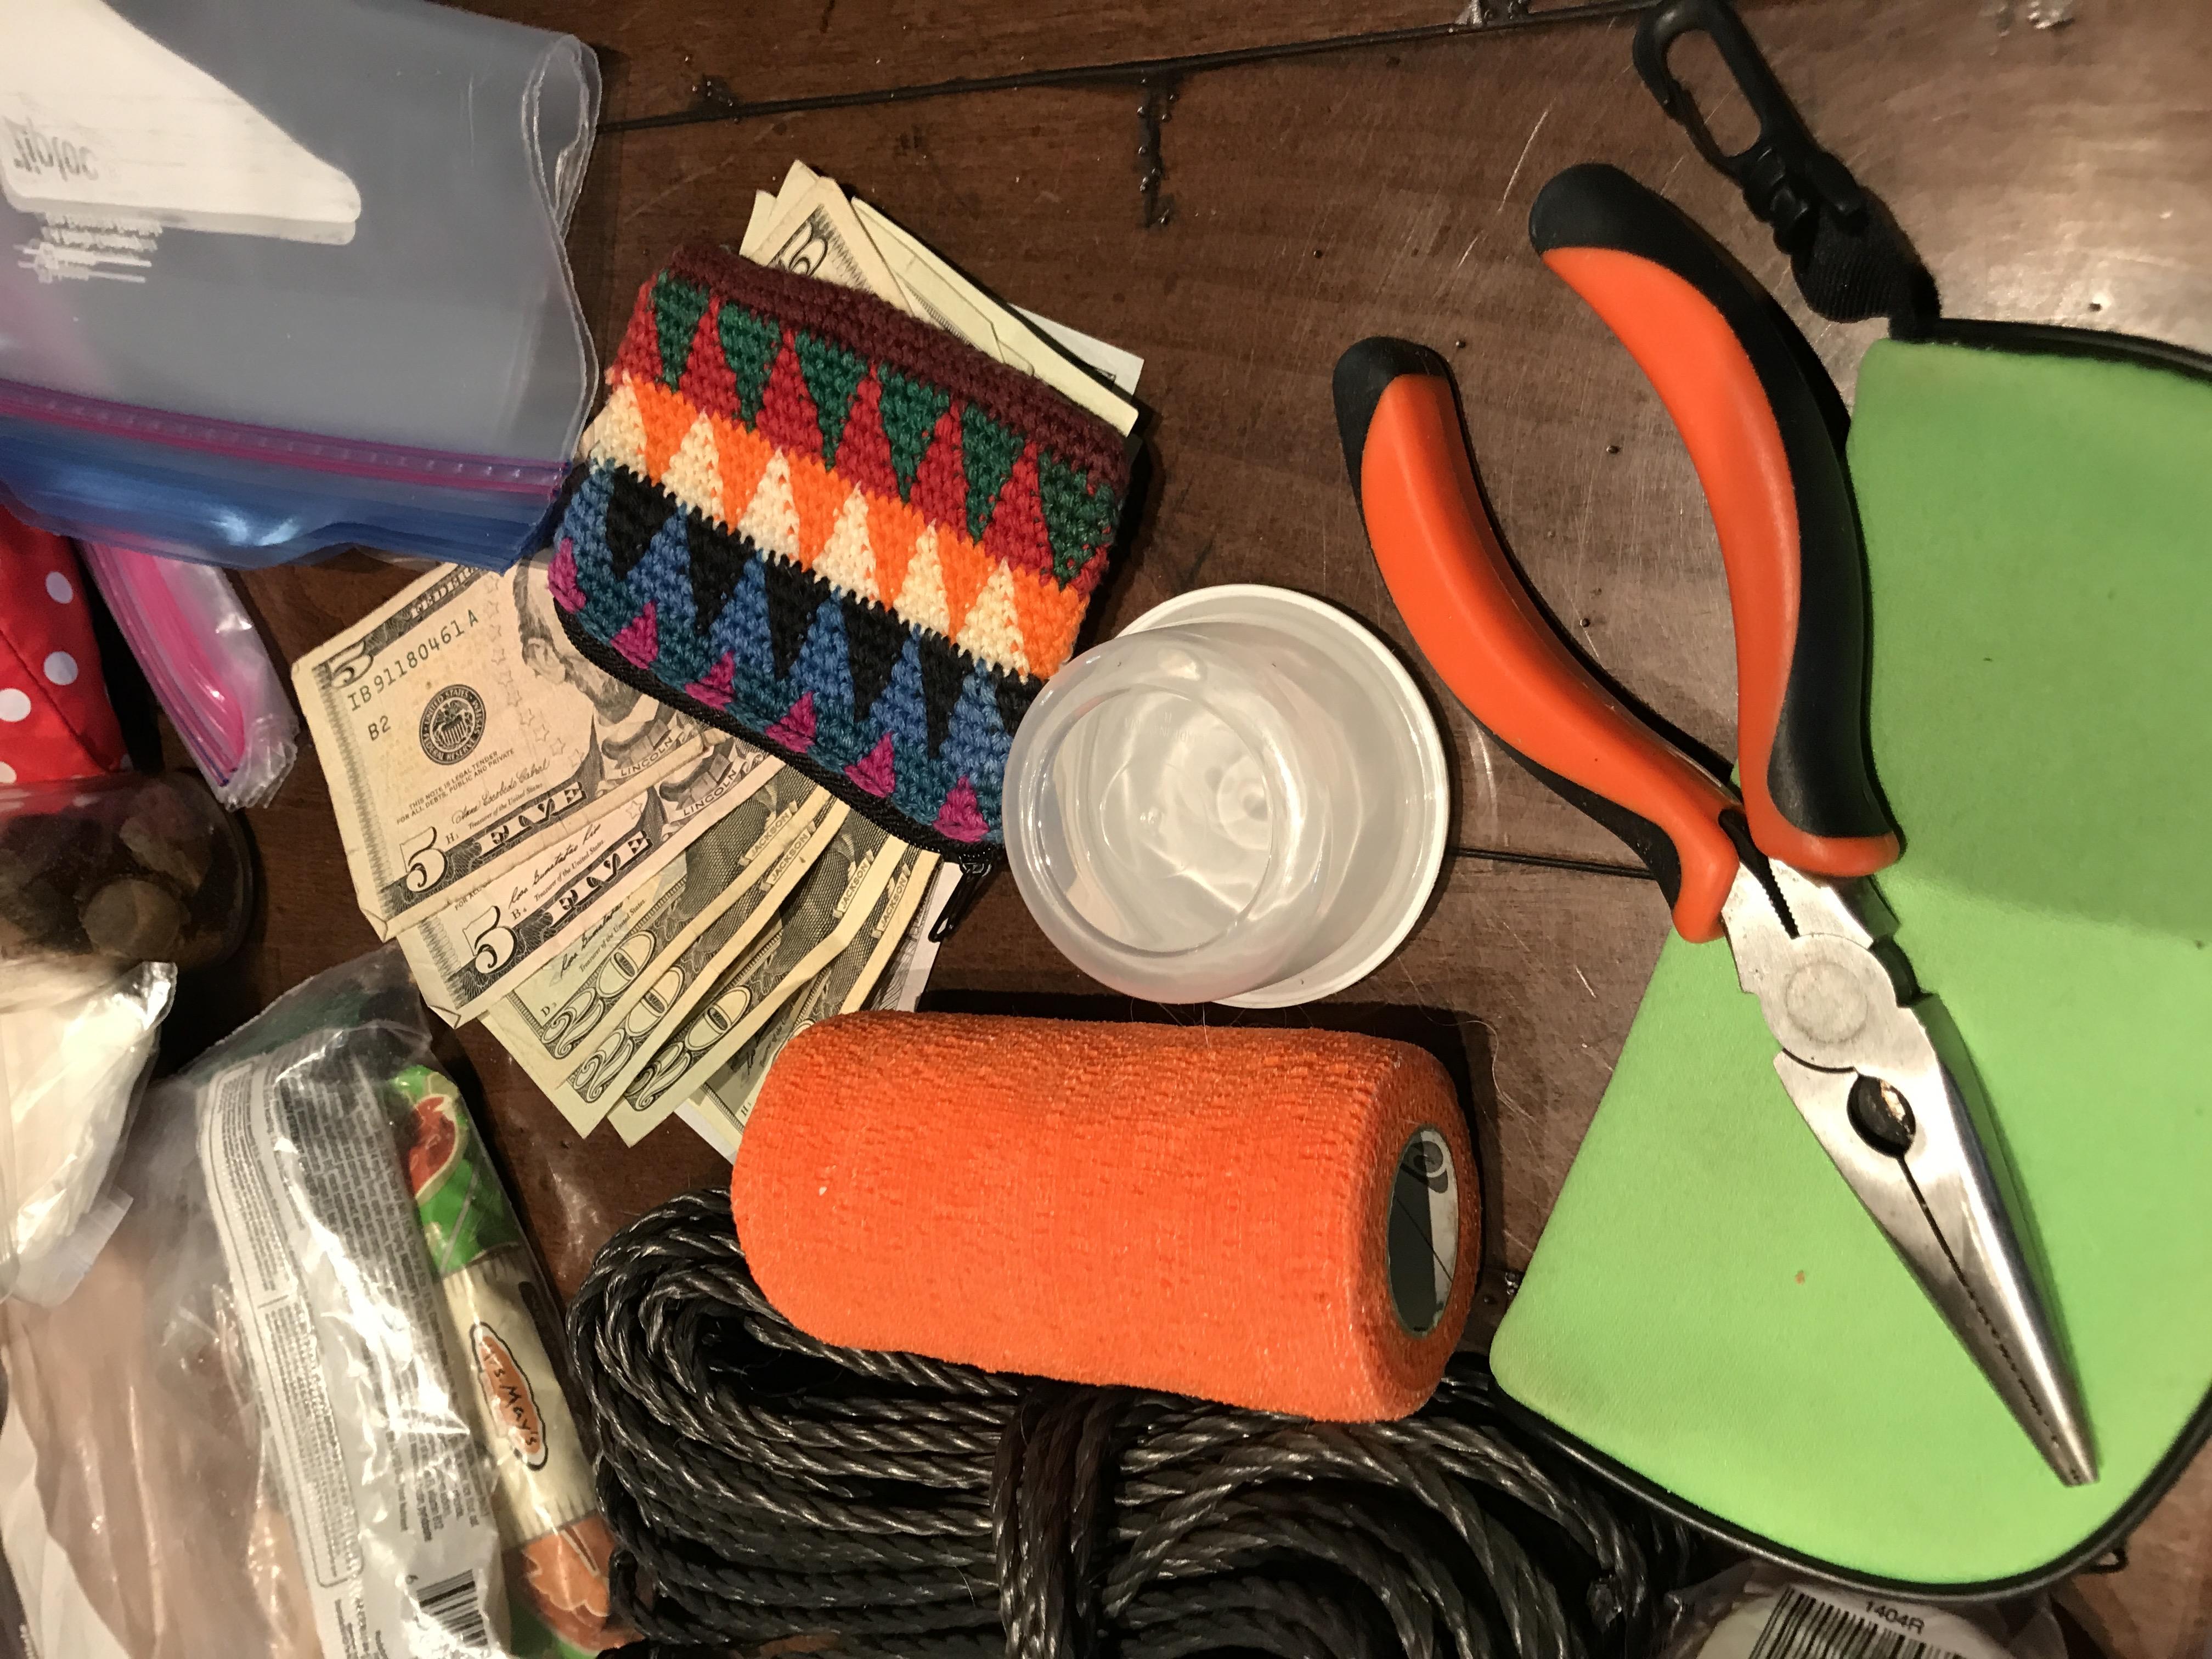 Keep cash with pet kits, too